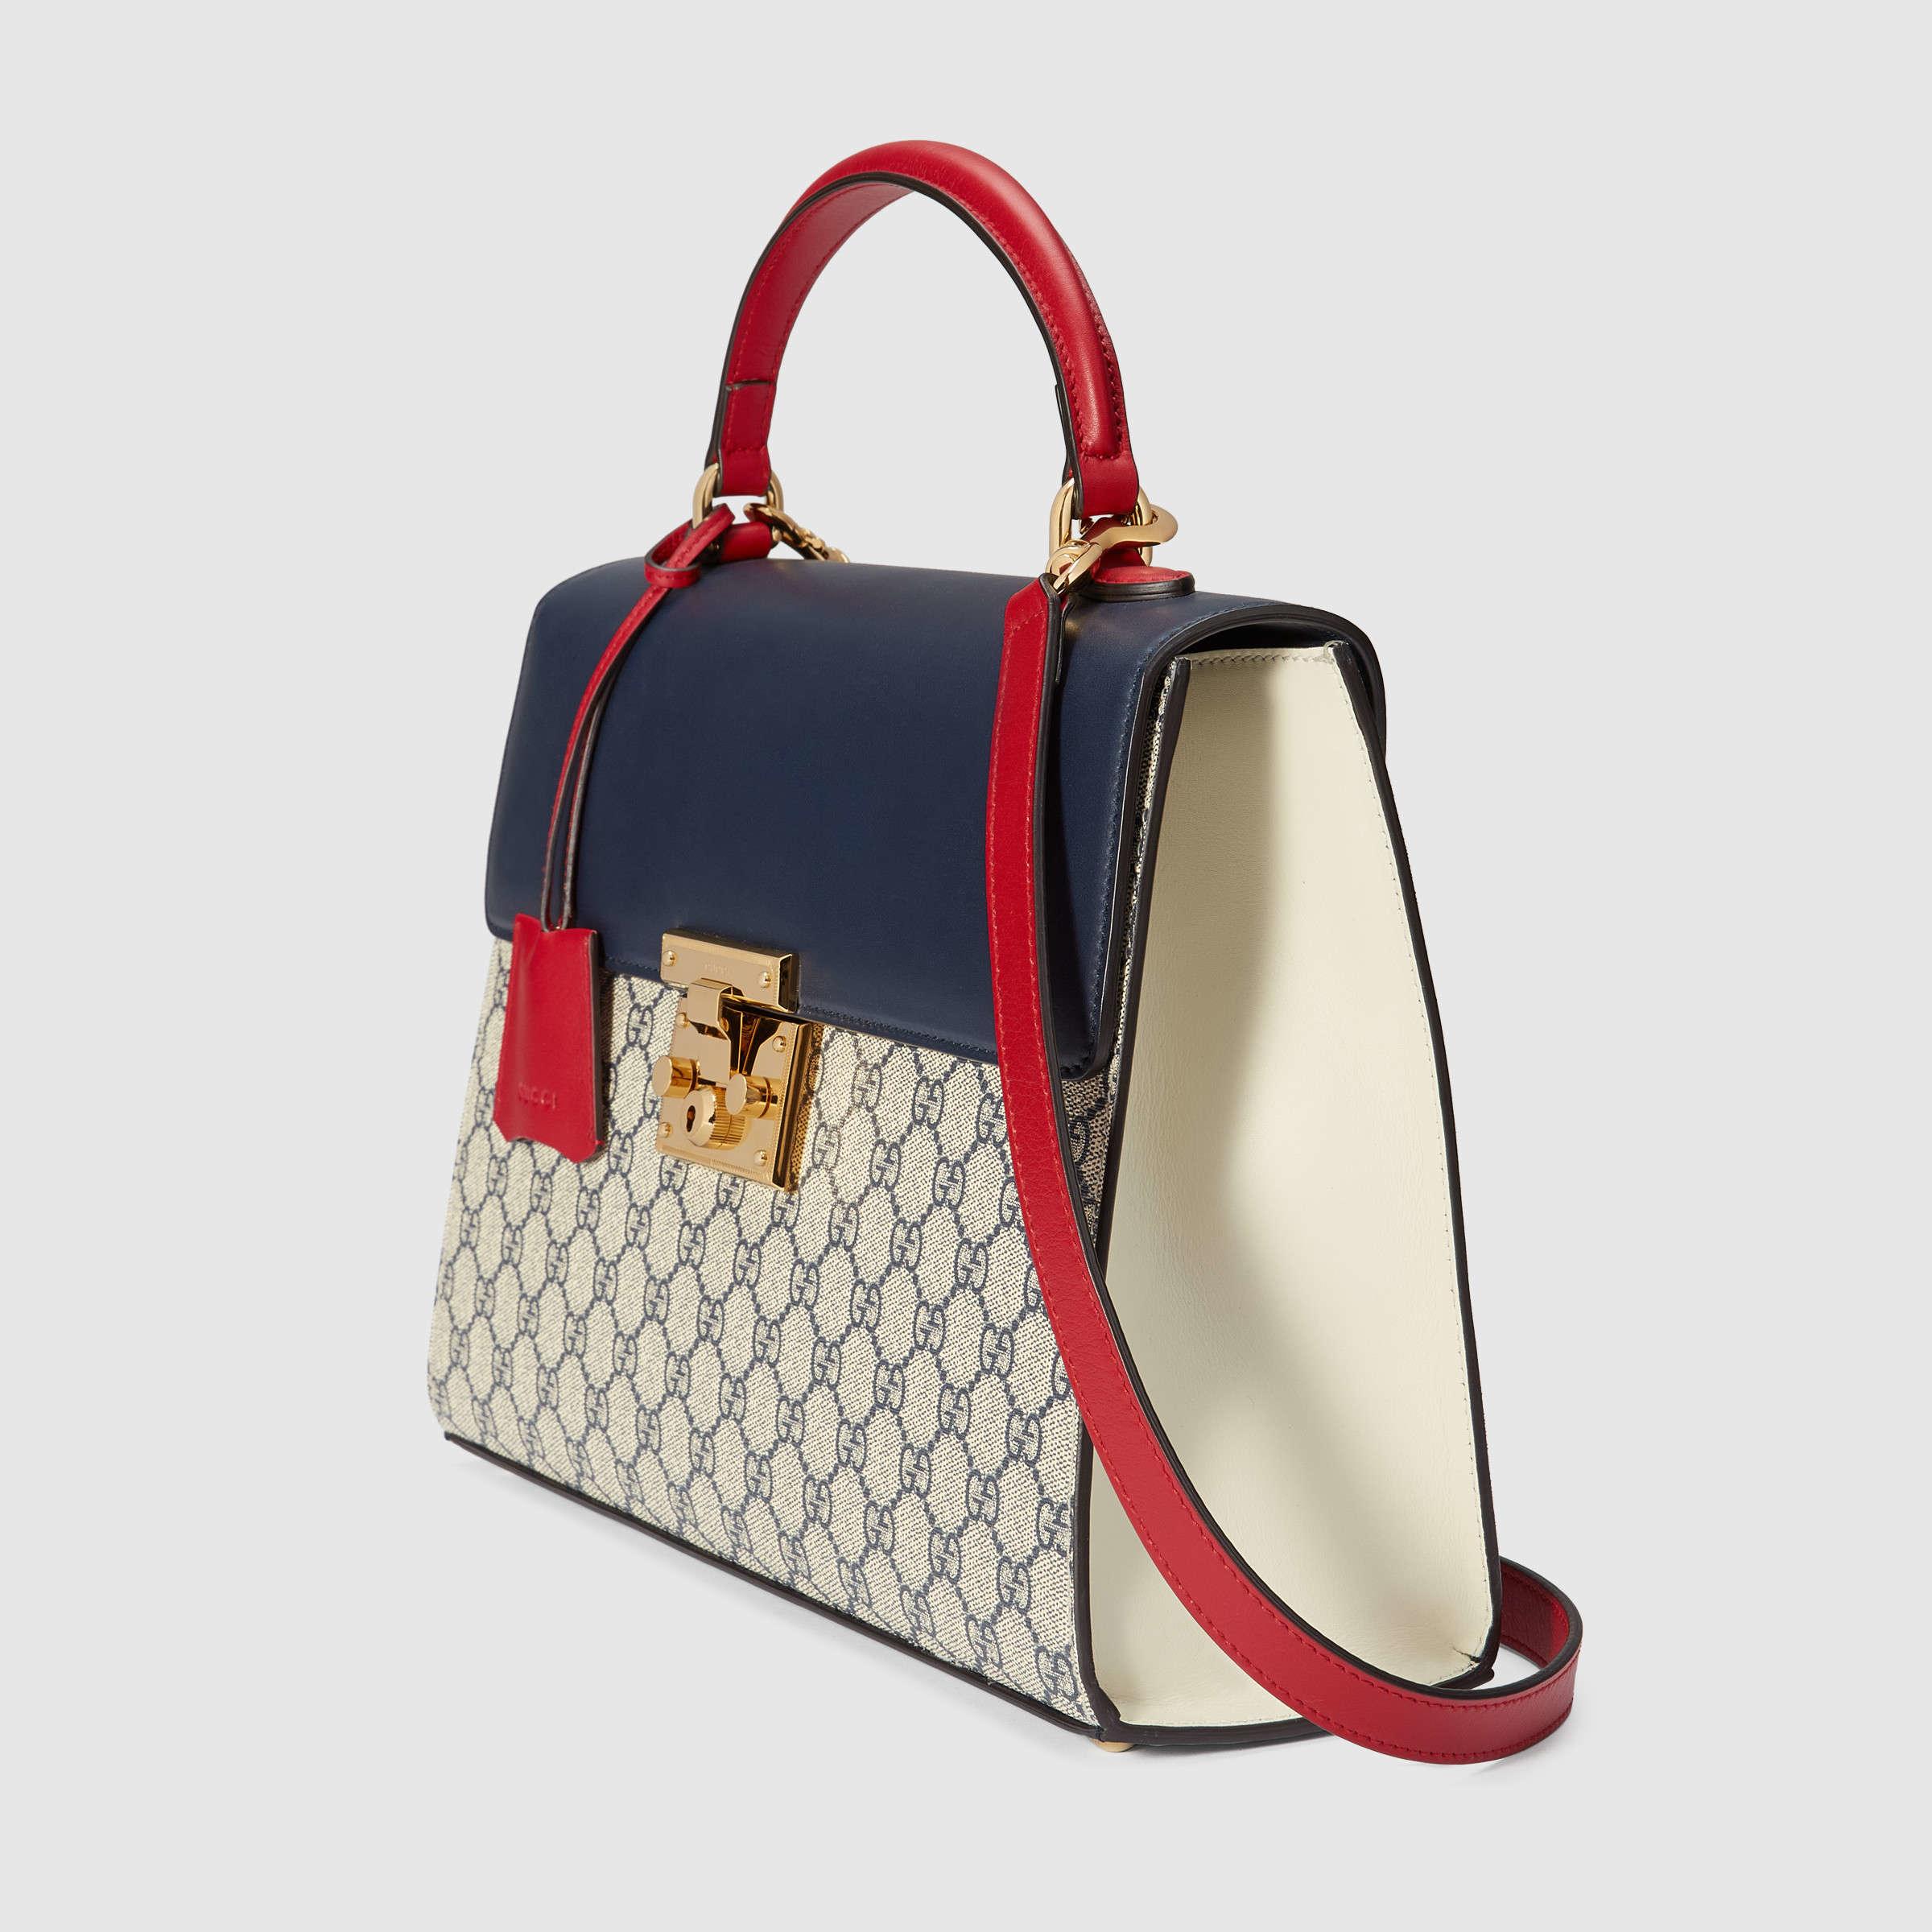 7a3c839b9ef4c Lyst - Gucci Padlock GG Supreme Top Handle Bag